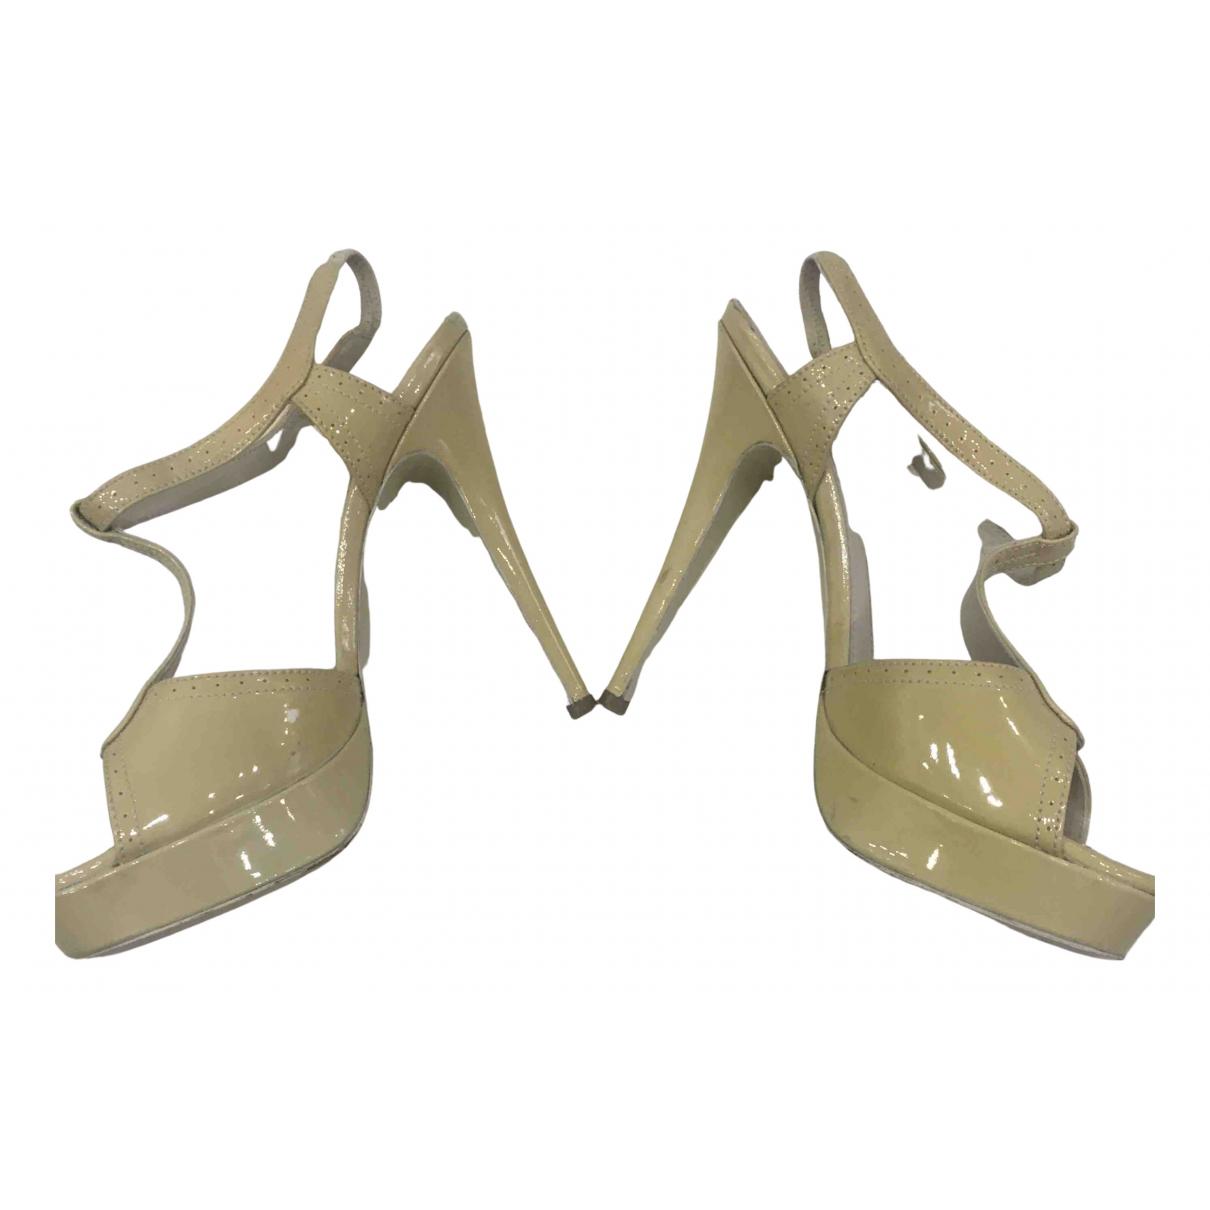 Yves Saint Laurent Tribute Beige Patent leather Sandals for Women 38.5 EU